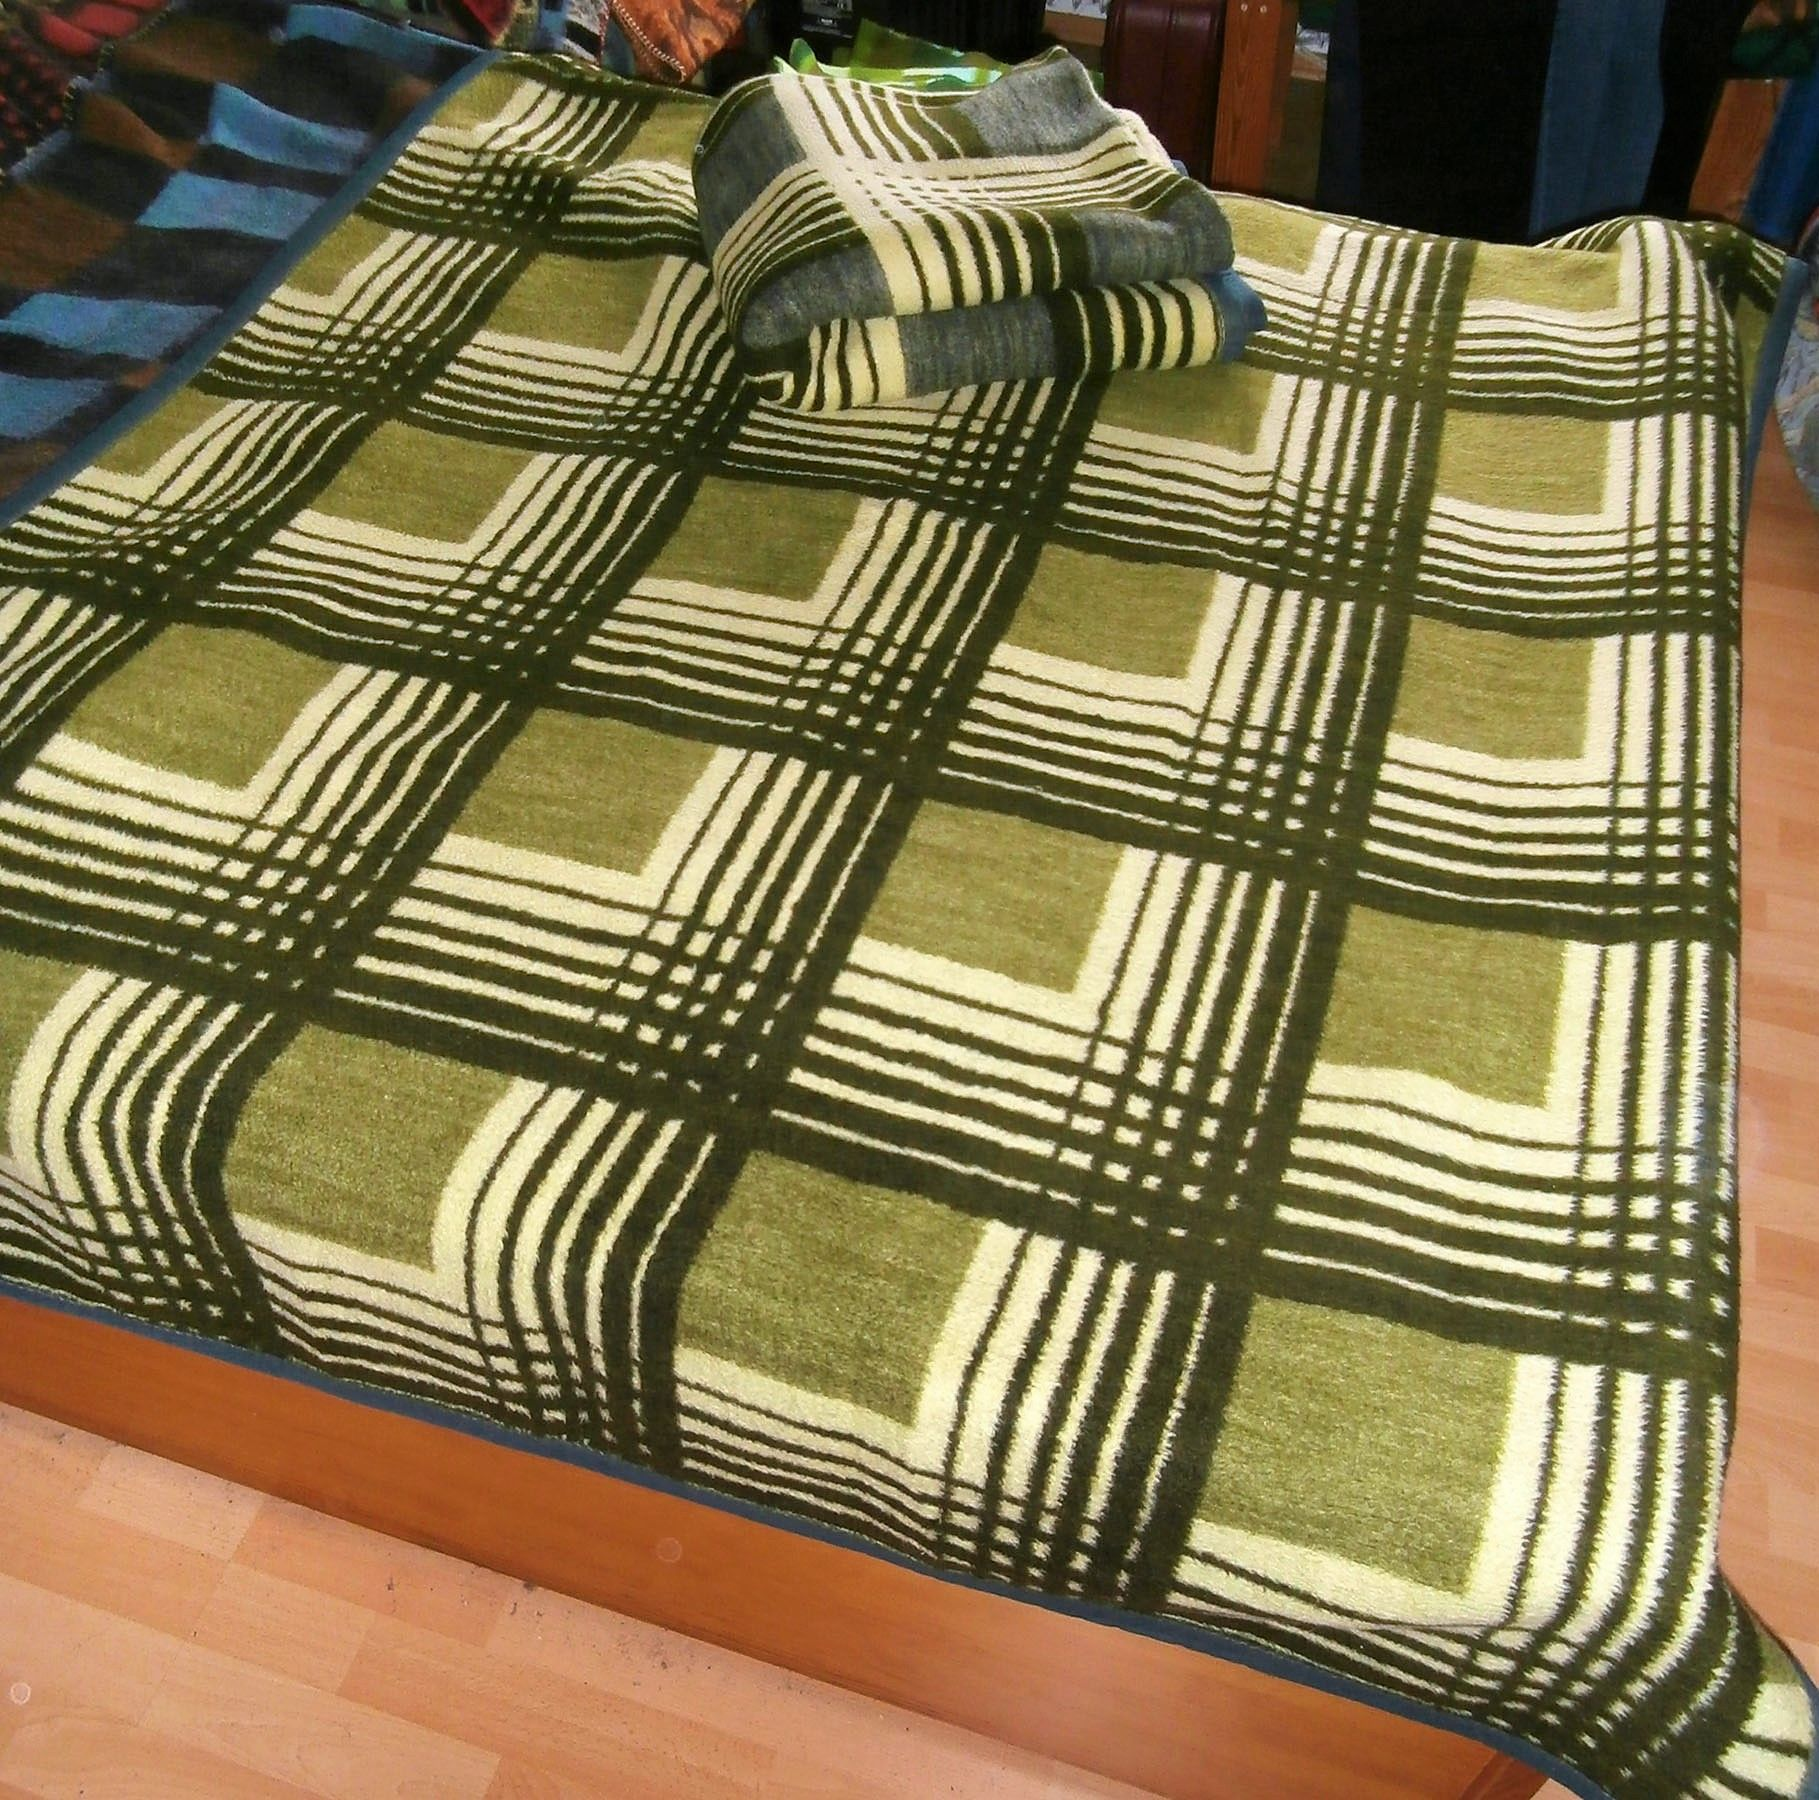 Prop Woolblanket Retroblankets Blanketmuseum Instagram 50s 60s Production Oudedekens Vintageblanket Vintagedeken Retrode Wolldecke Flauschig Decken